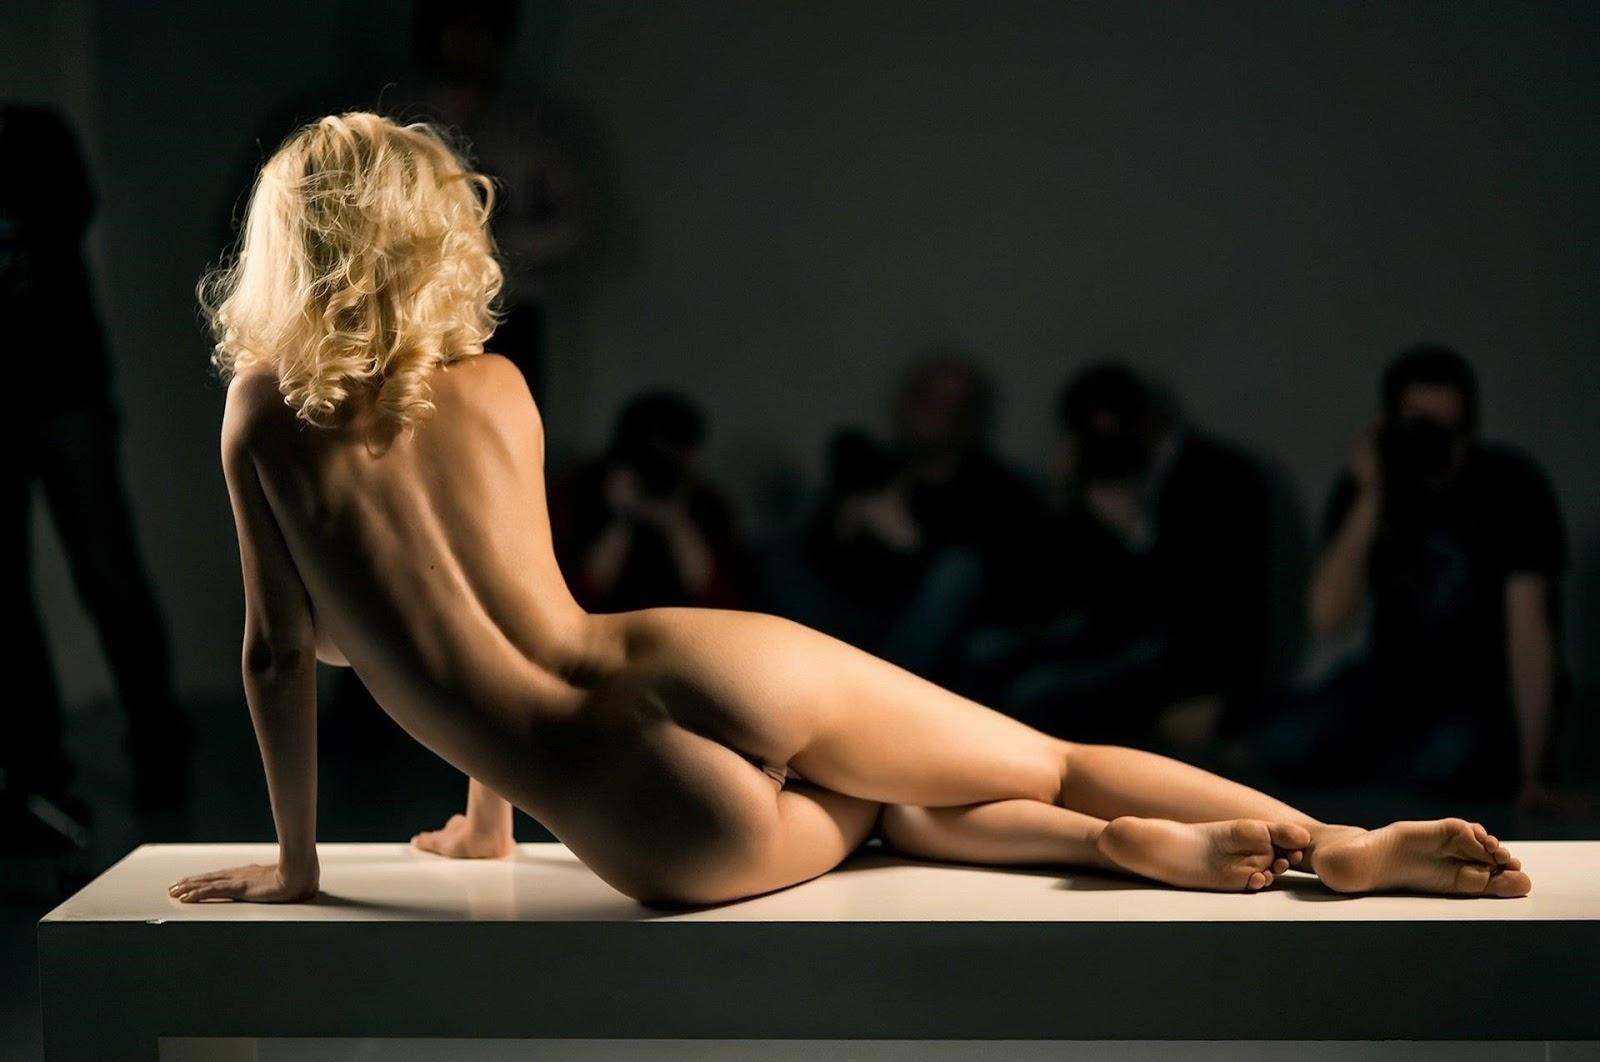 Posing nude art class college model